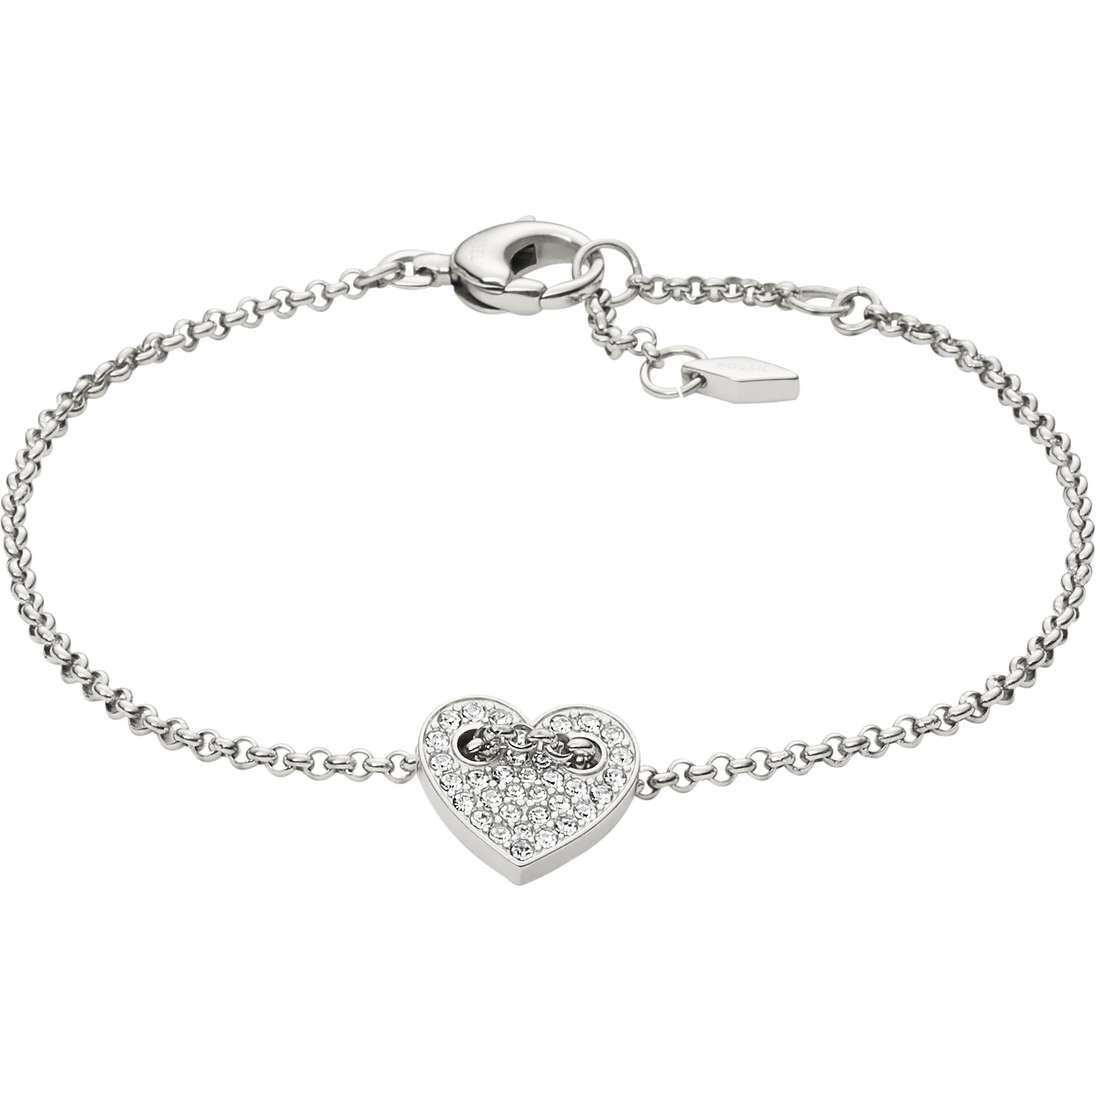 bracelet woman jewellery Fossil Spring 16 JF02267040